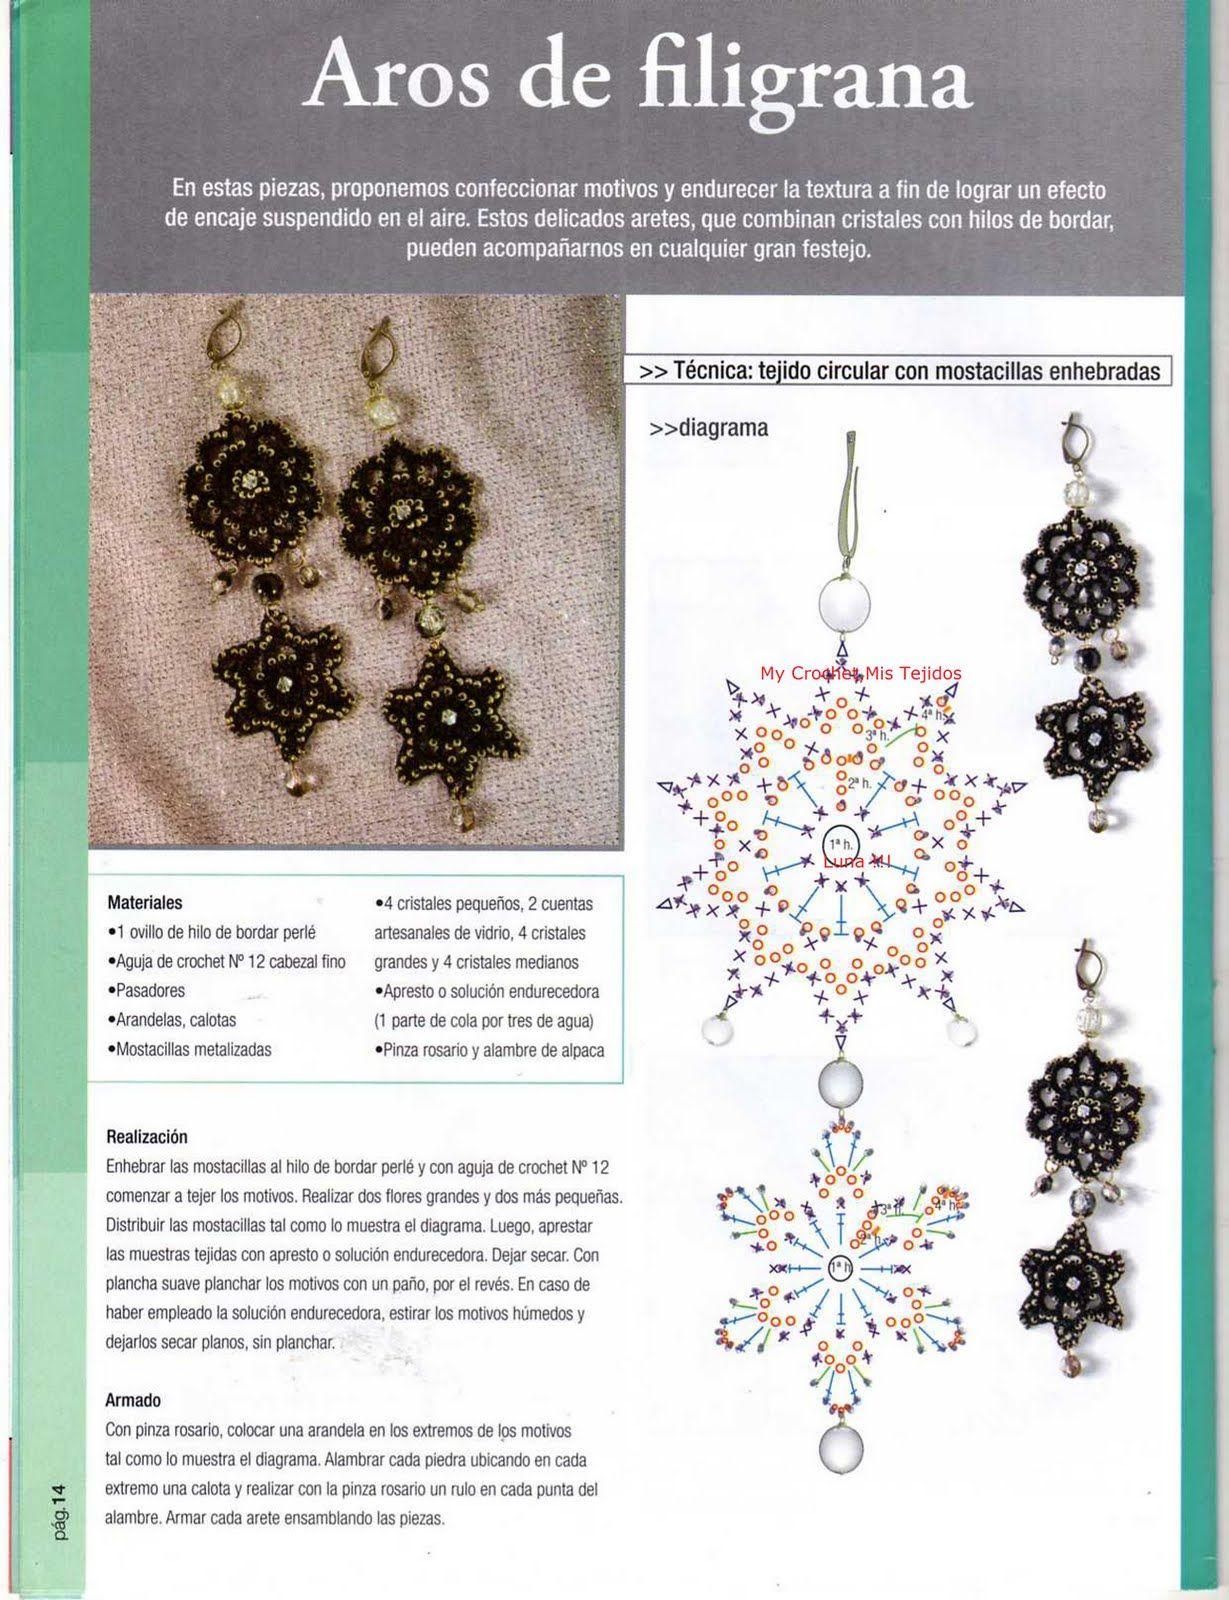 My Crochet , Mis Tejidos by Luna: Ascesorios... Beautiful dangle ...